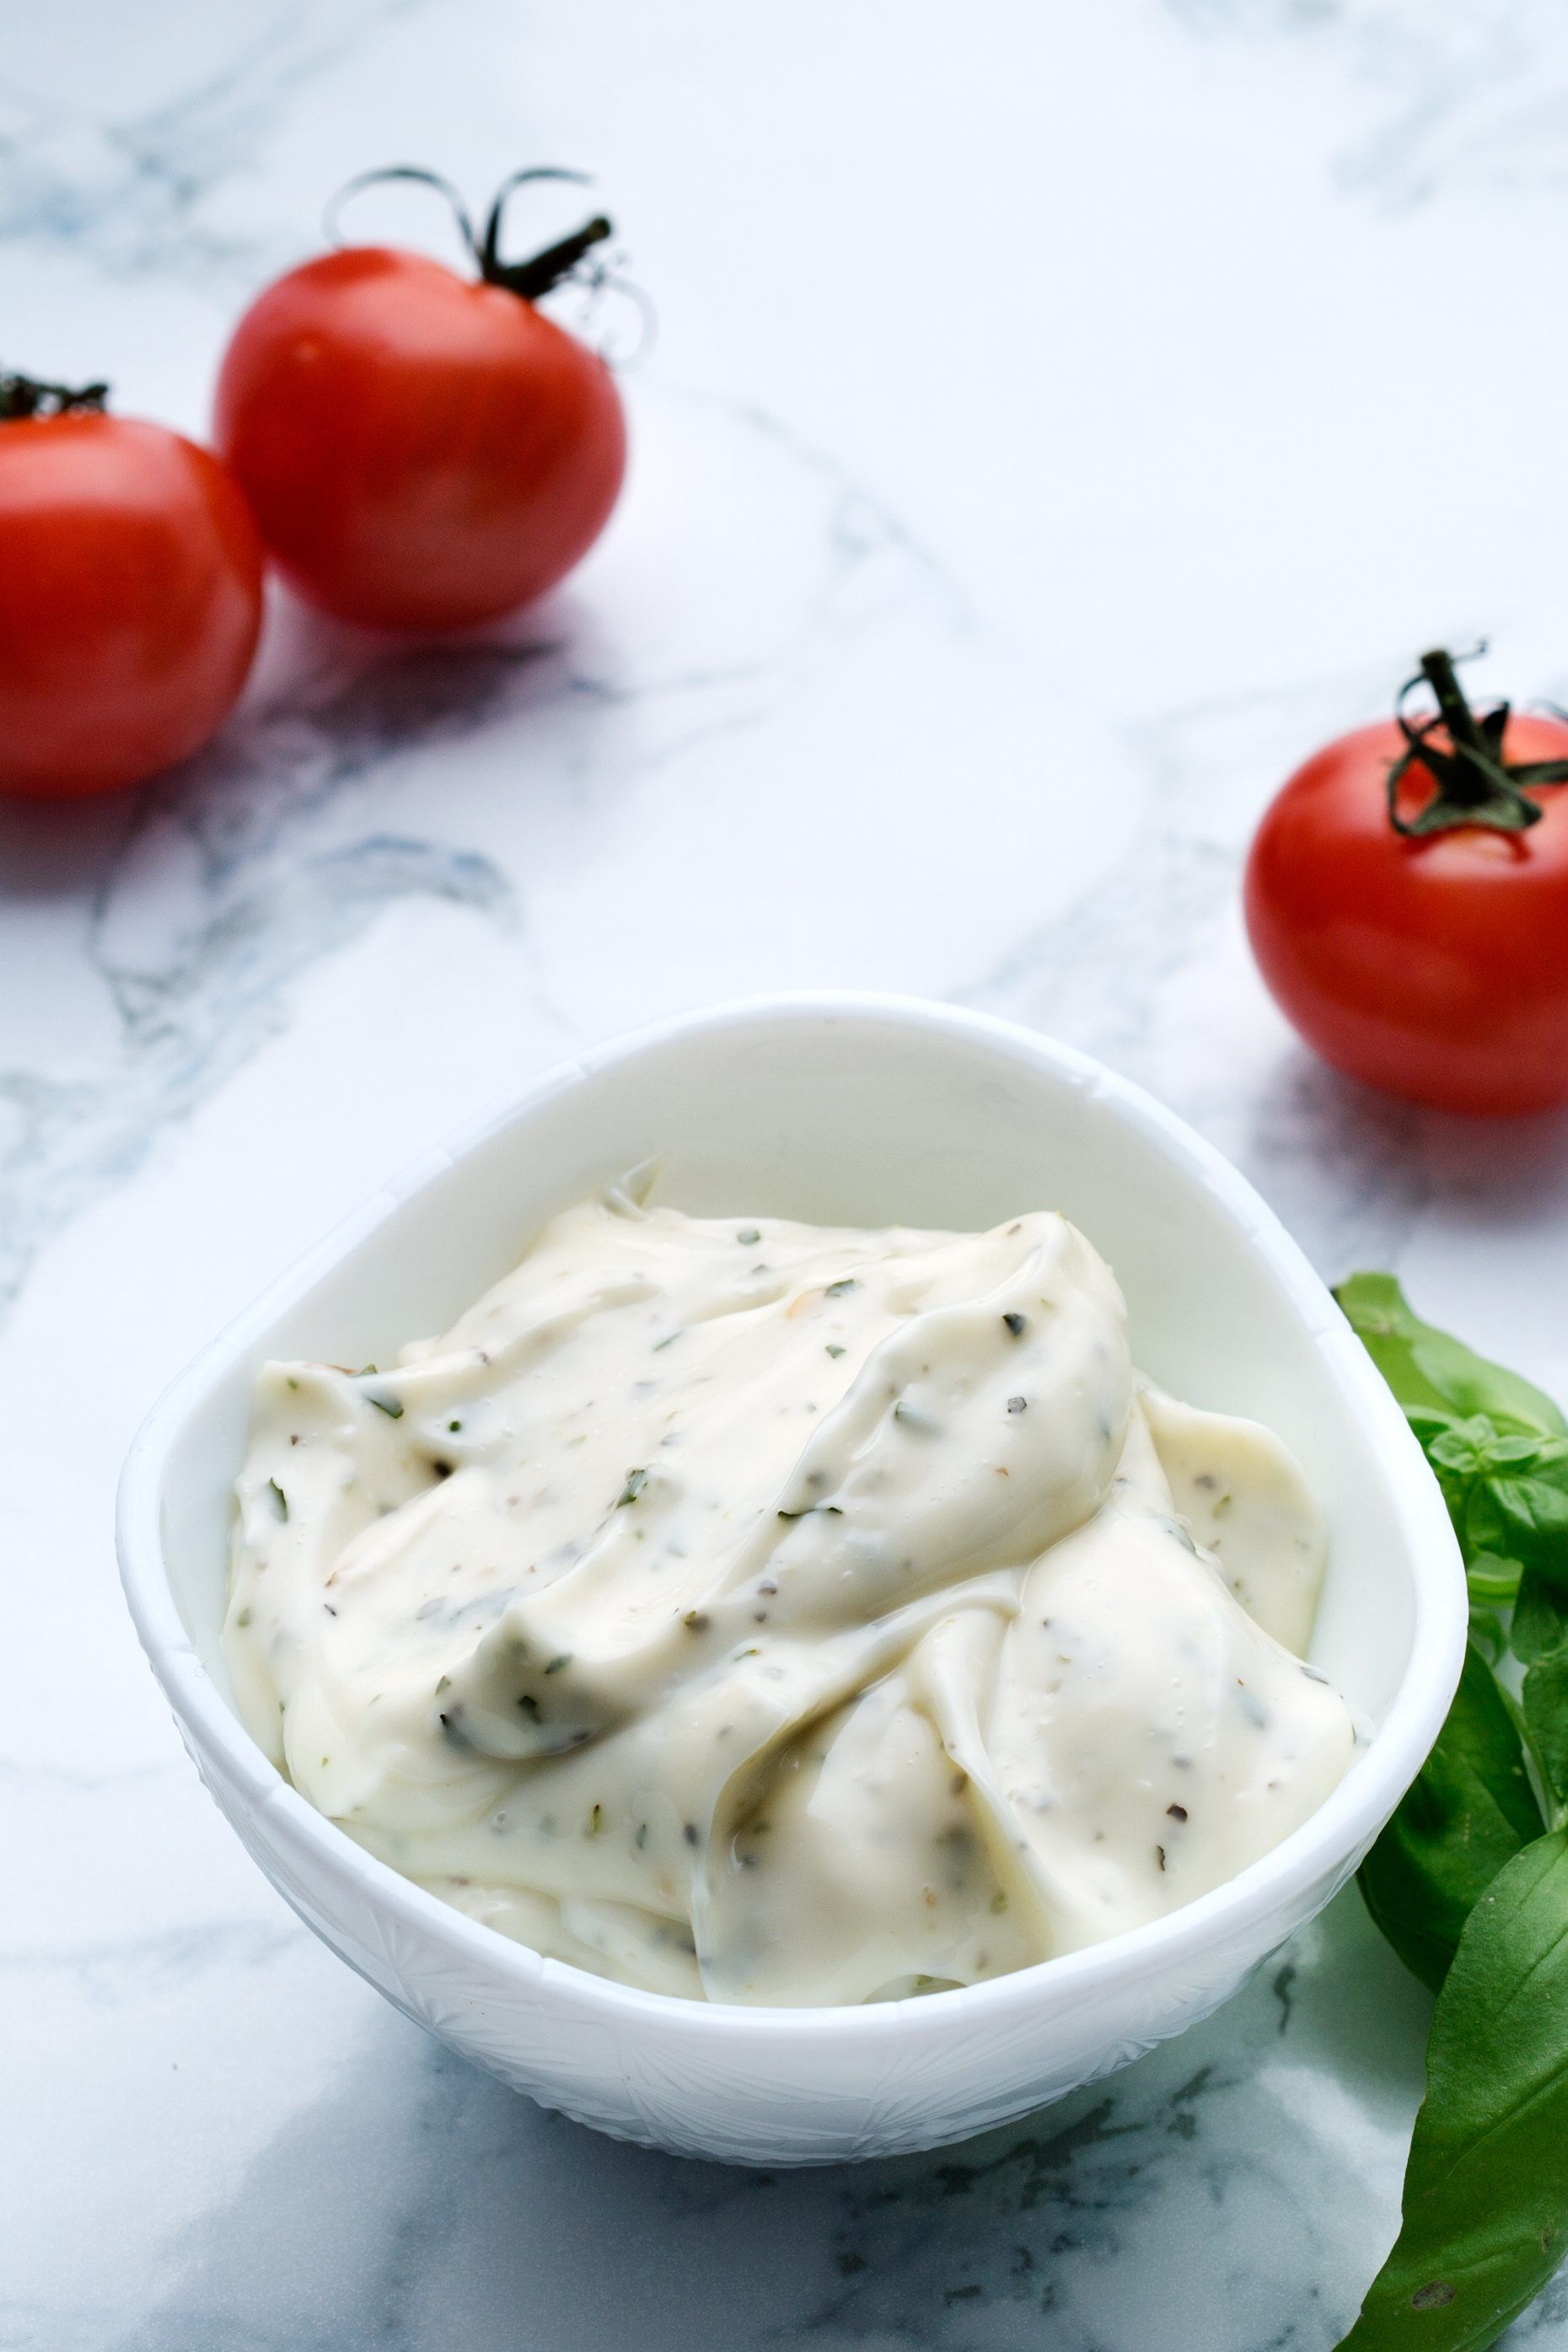 Production mayonnaise sauces